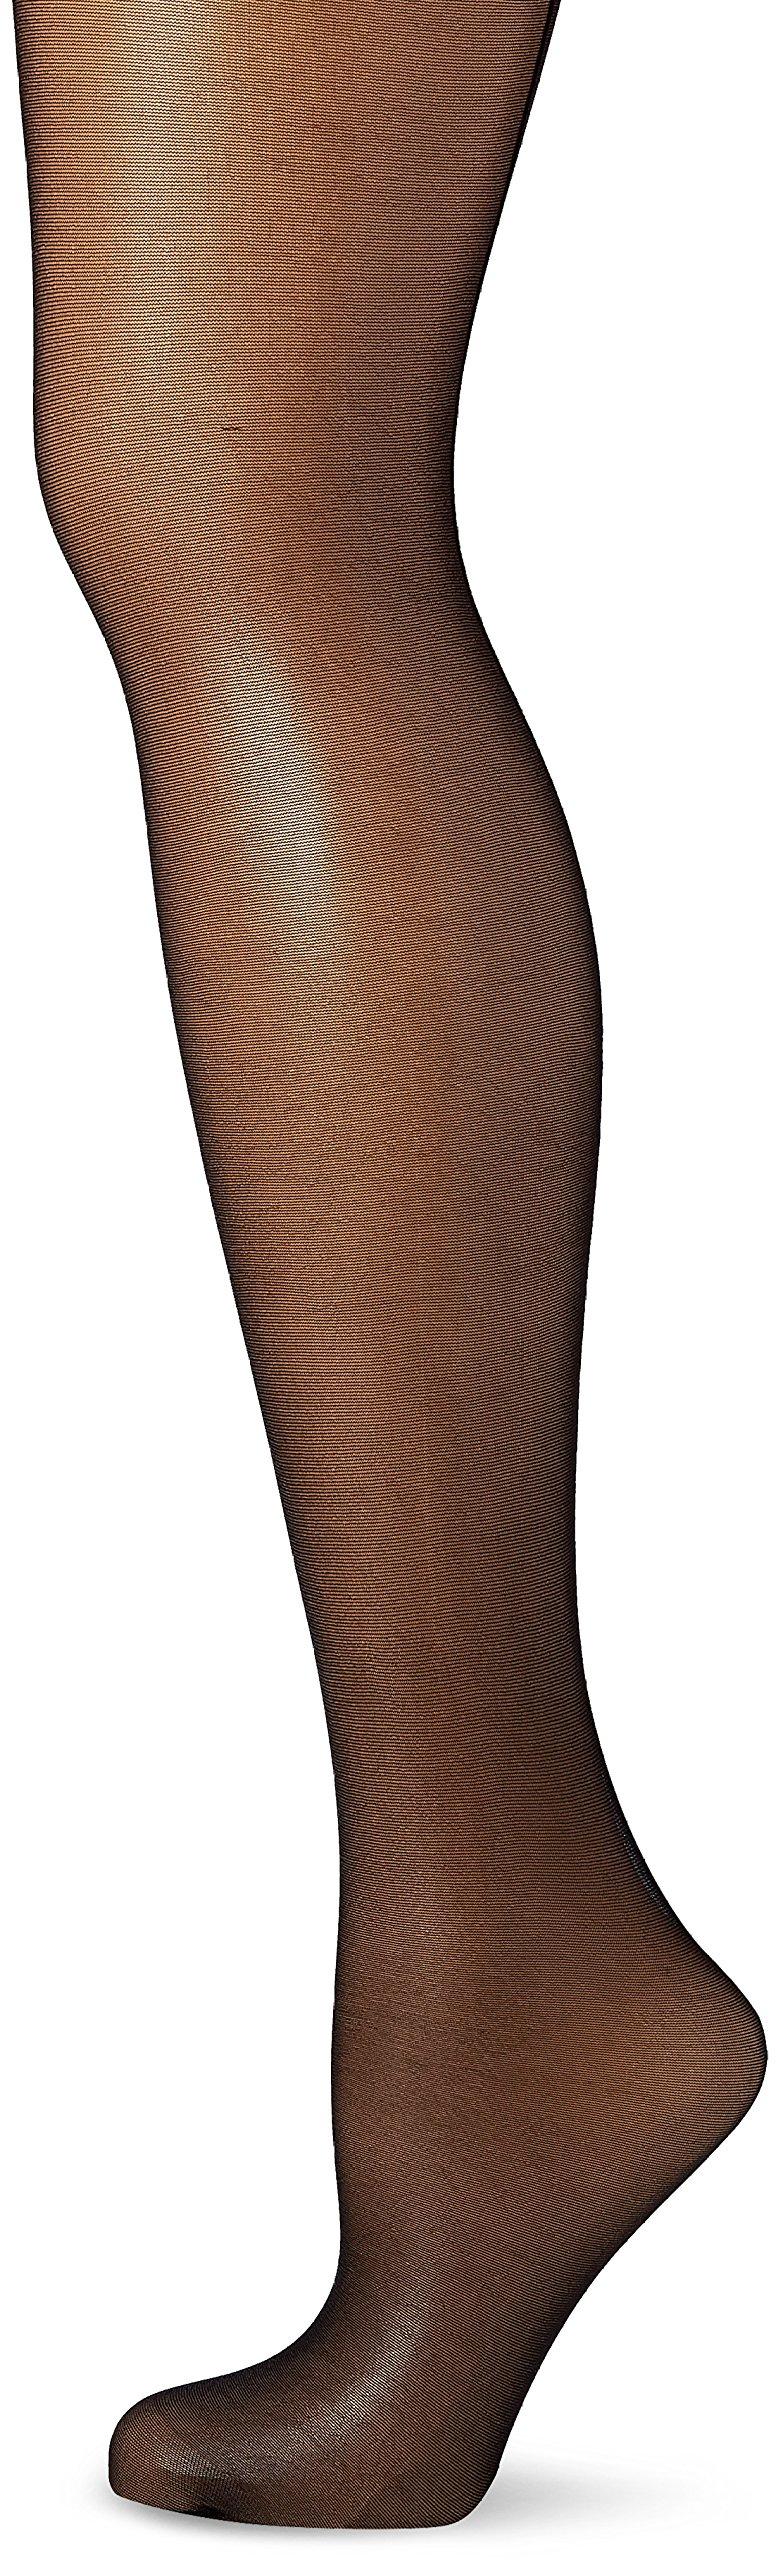 Miss O Seamed Open Crotch Pantyhose -Black-L/XL